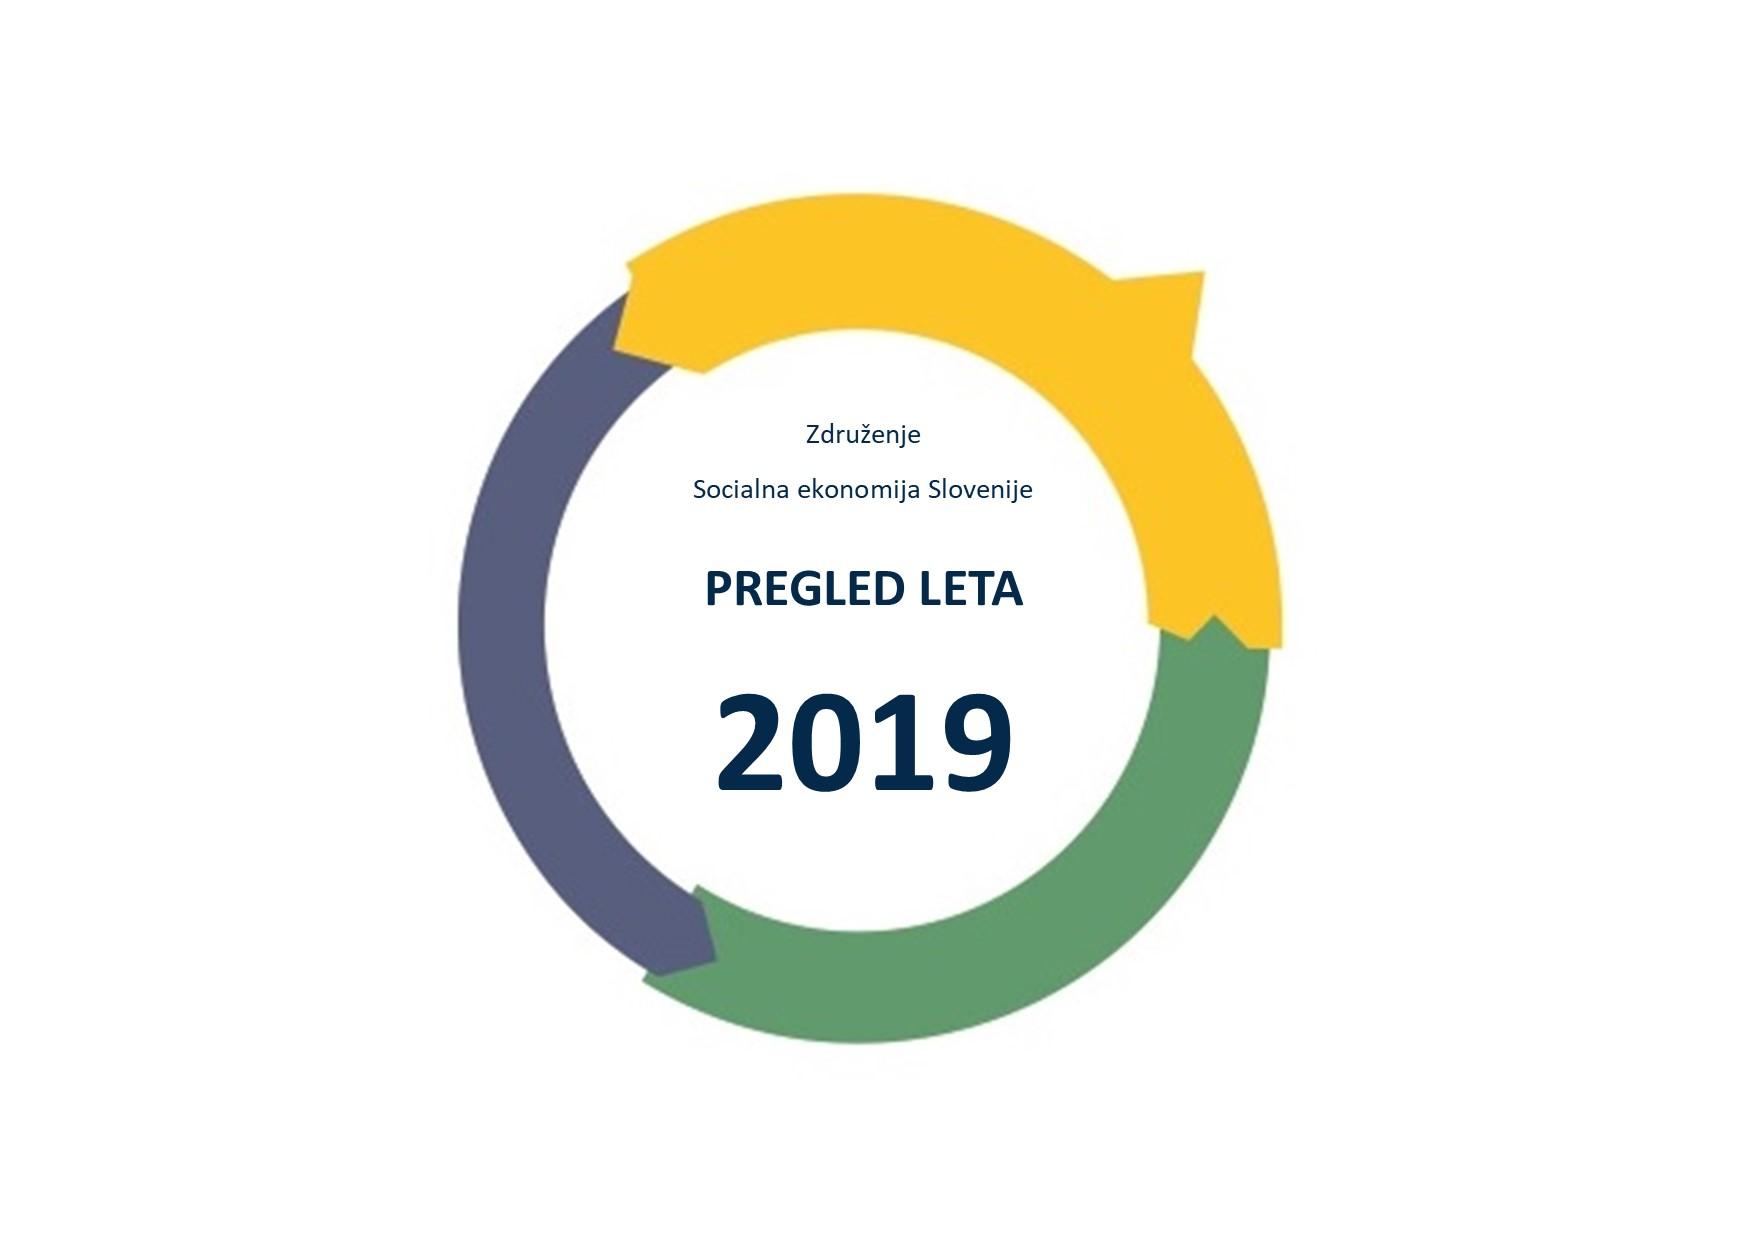 PREGLED-LETA-2019